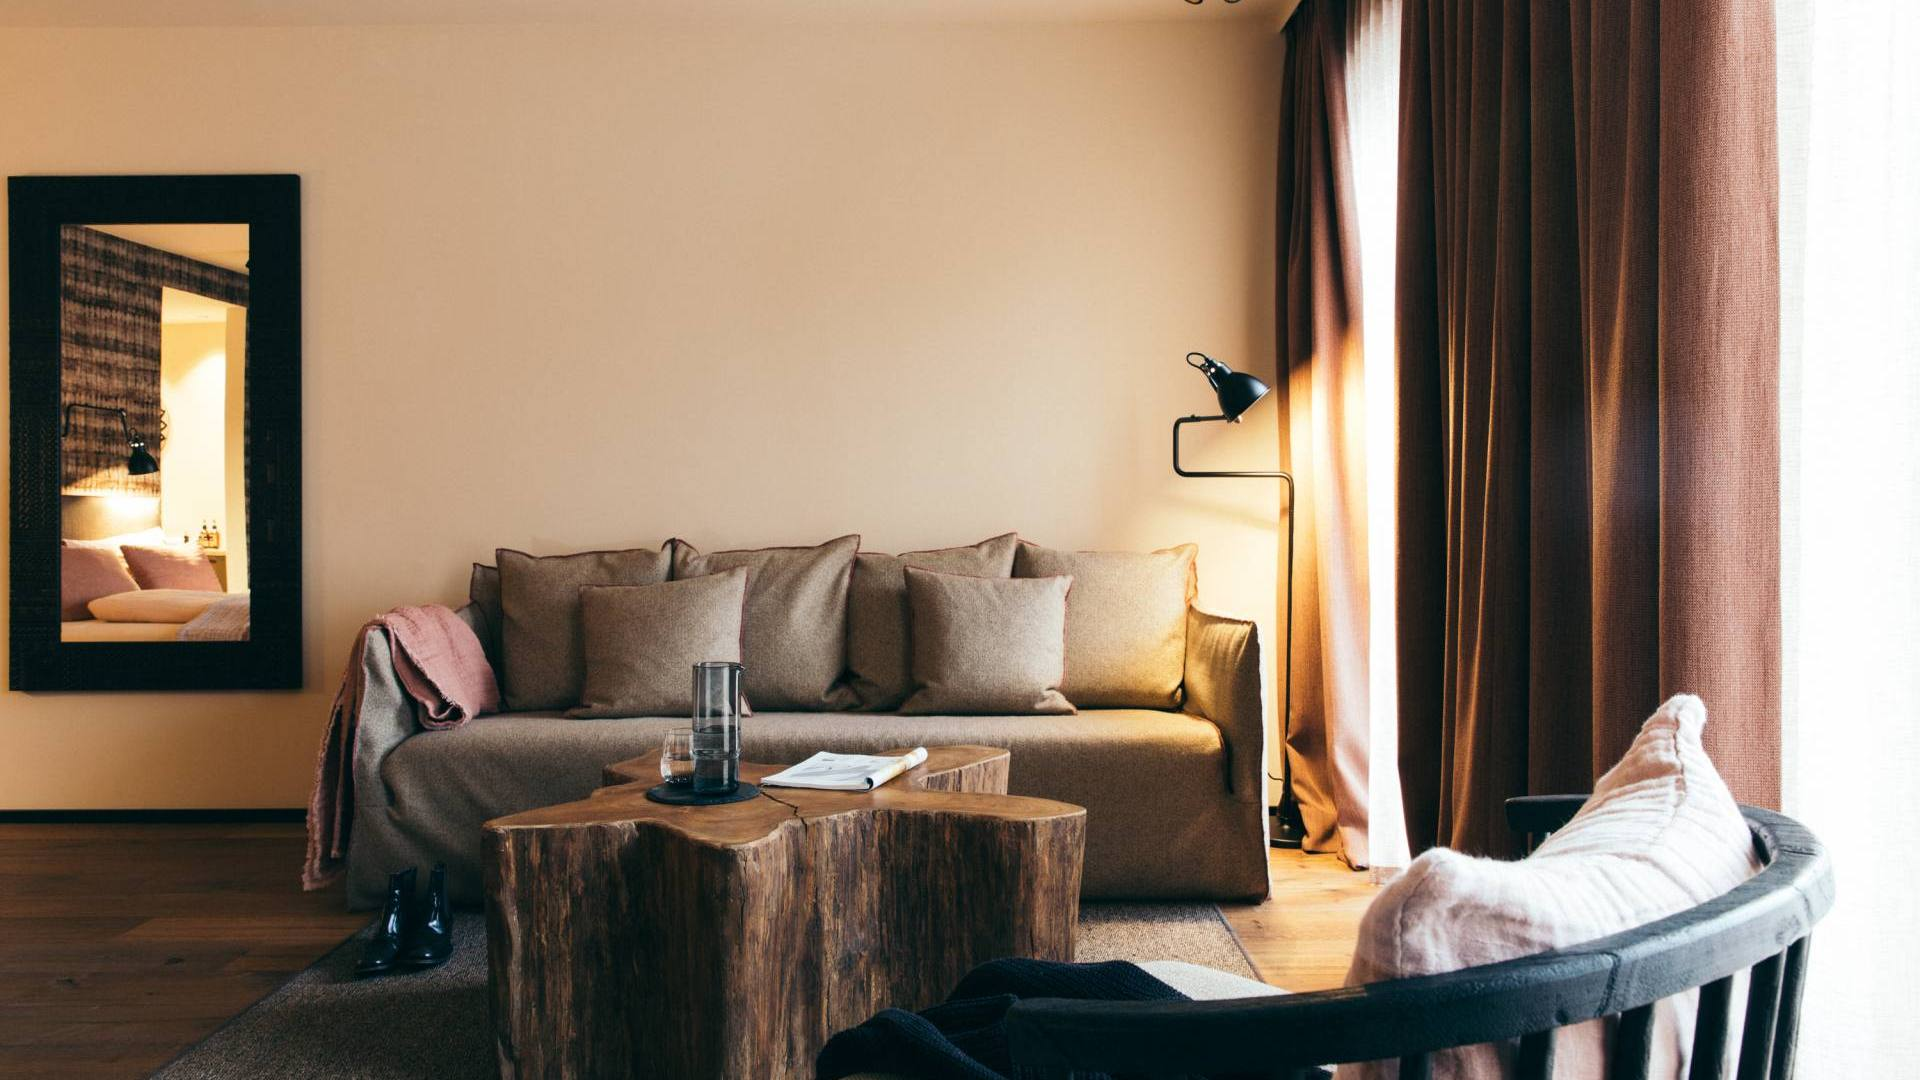 Bronze Suite – DAS RIVUS – Luxus Suiten in Leogang, Österreich